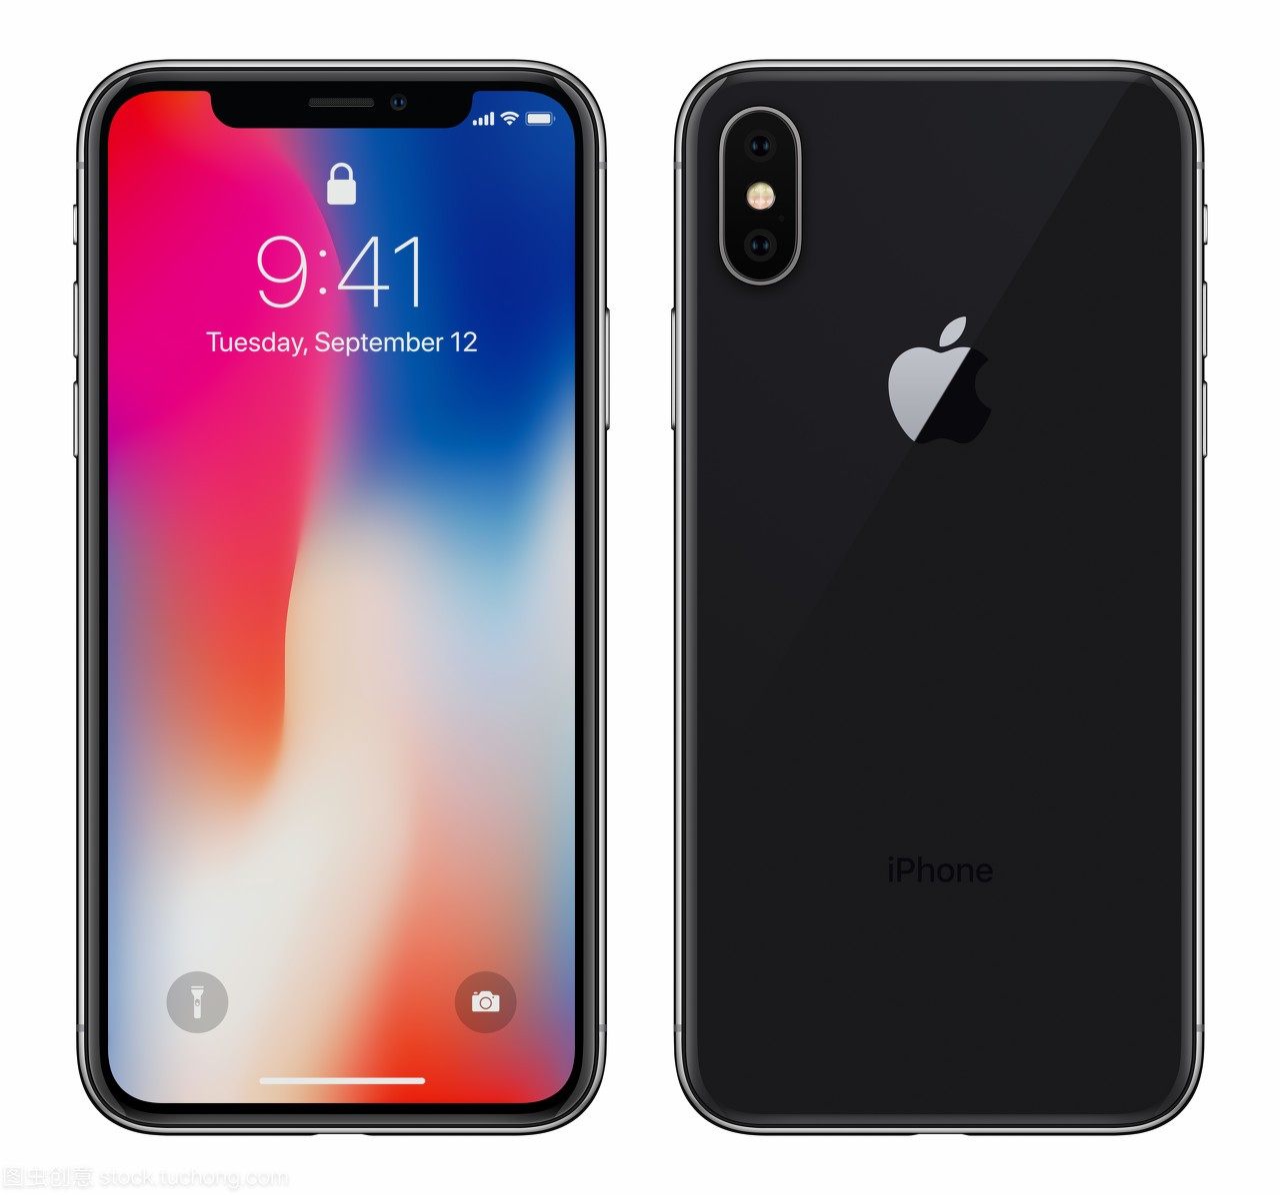 x 与 ios 11 锁屏界面前侧和背面 品牌新现实手机黑色智能手机在苹果